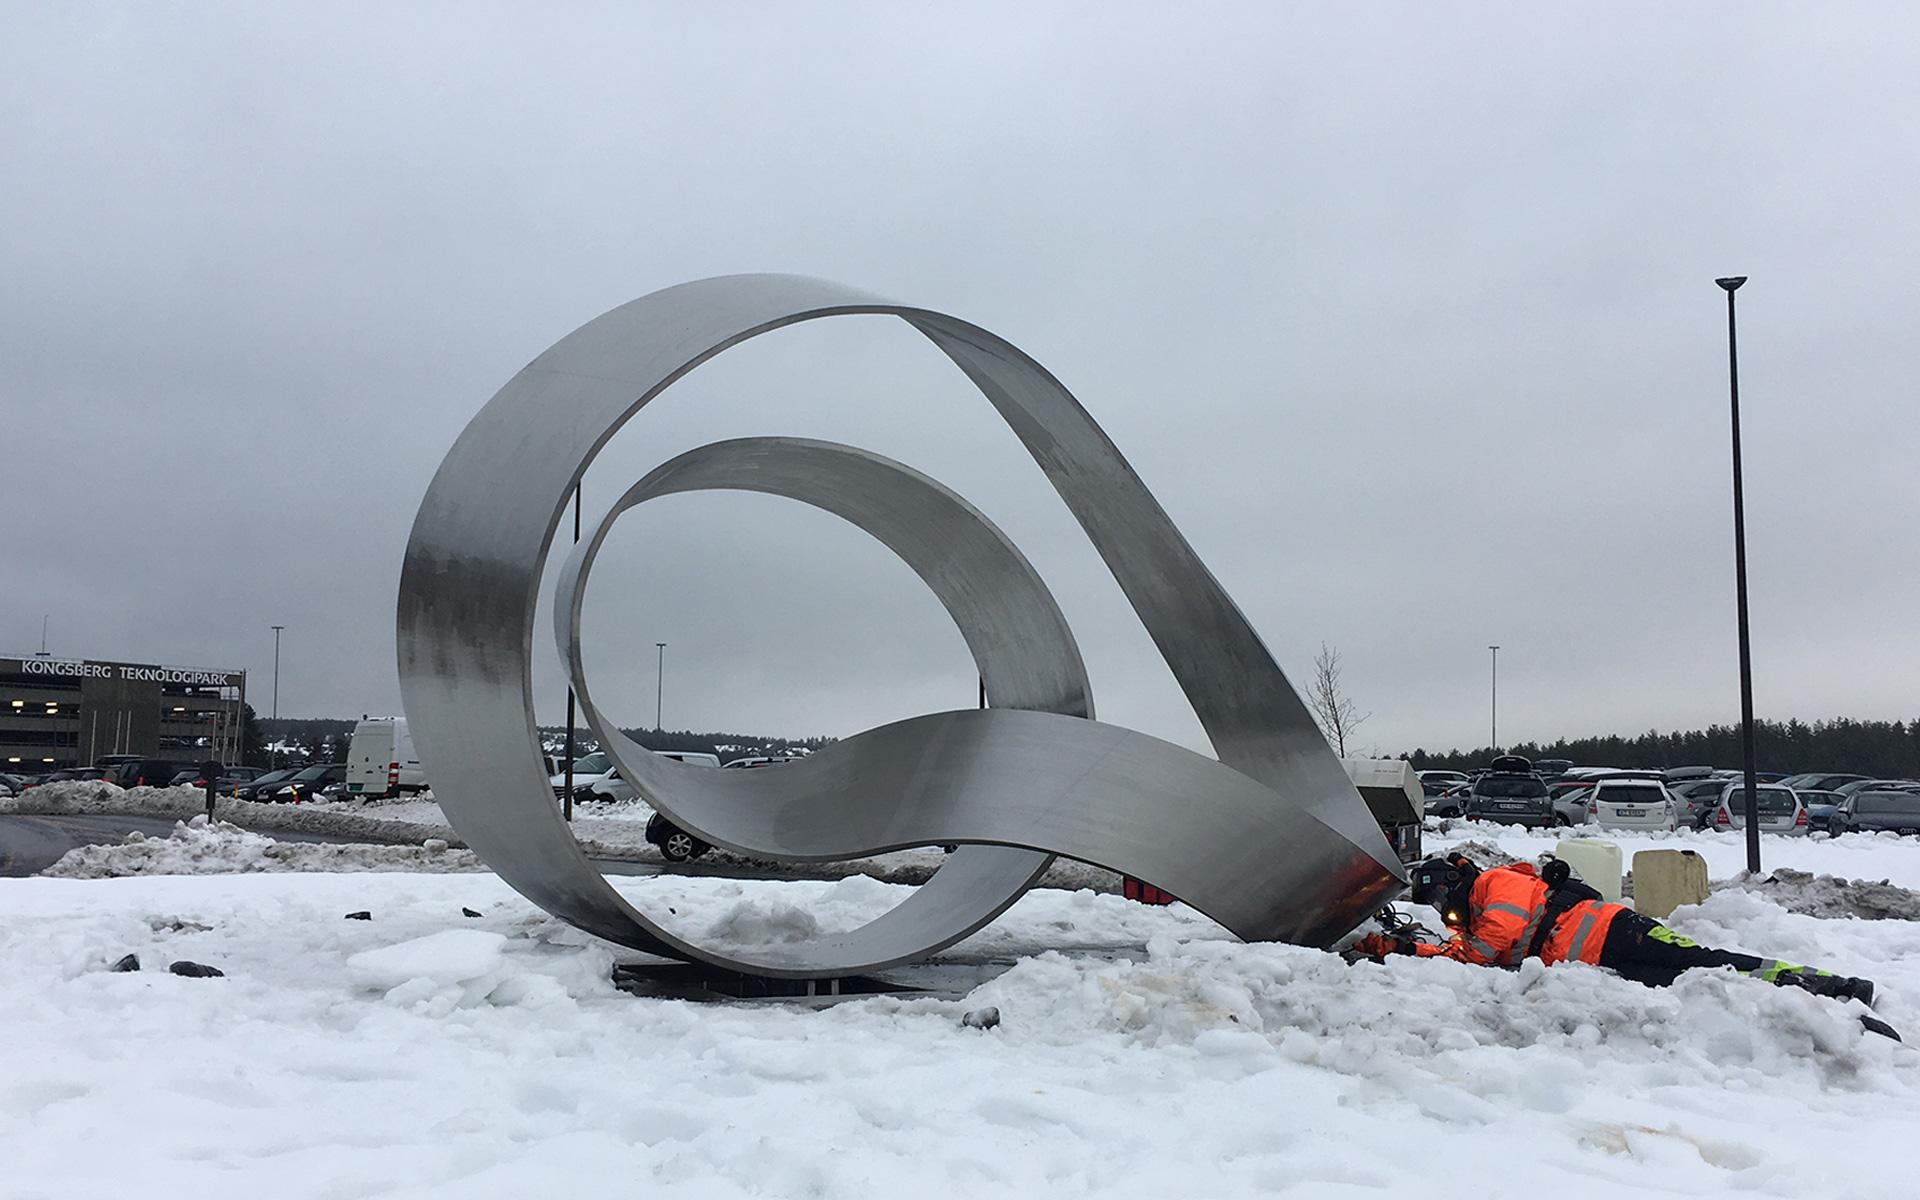 Stående Møbius, montering / Upright Moebius, installation